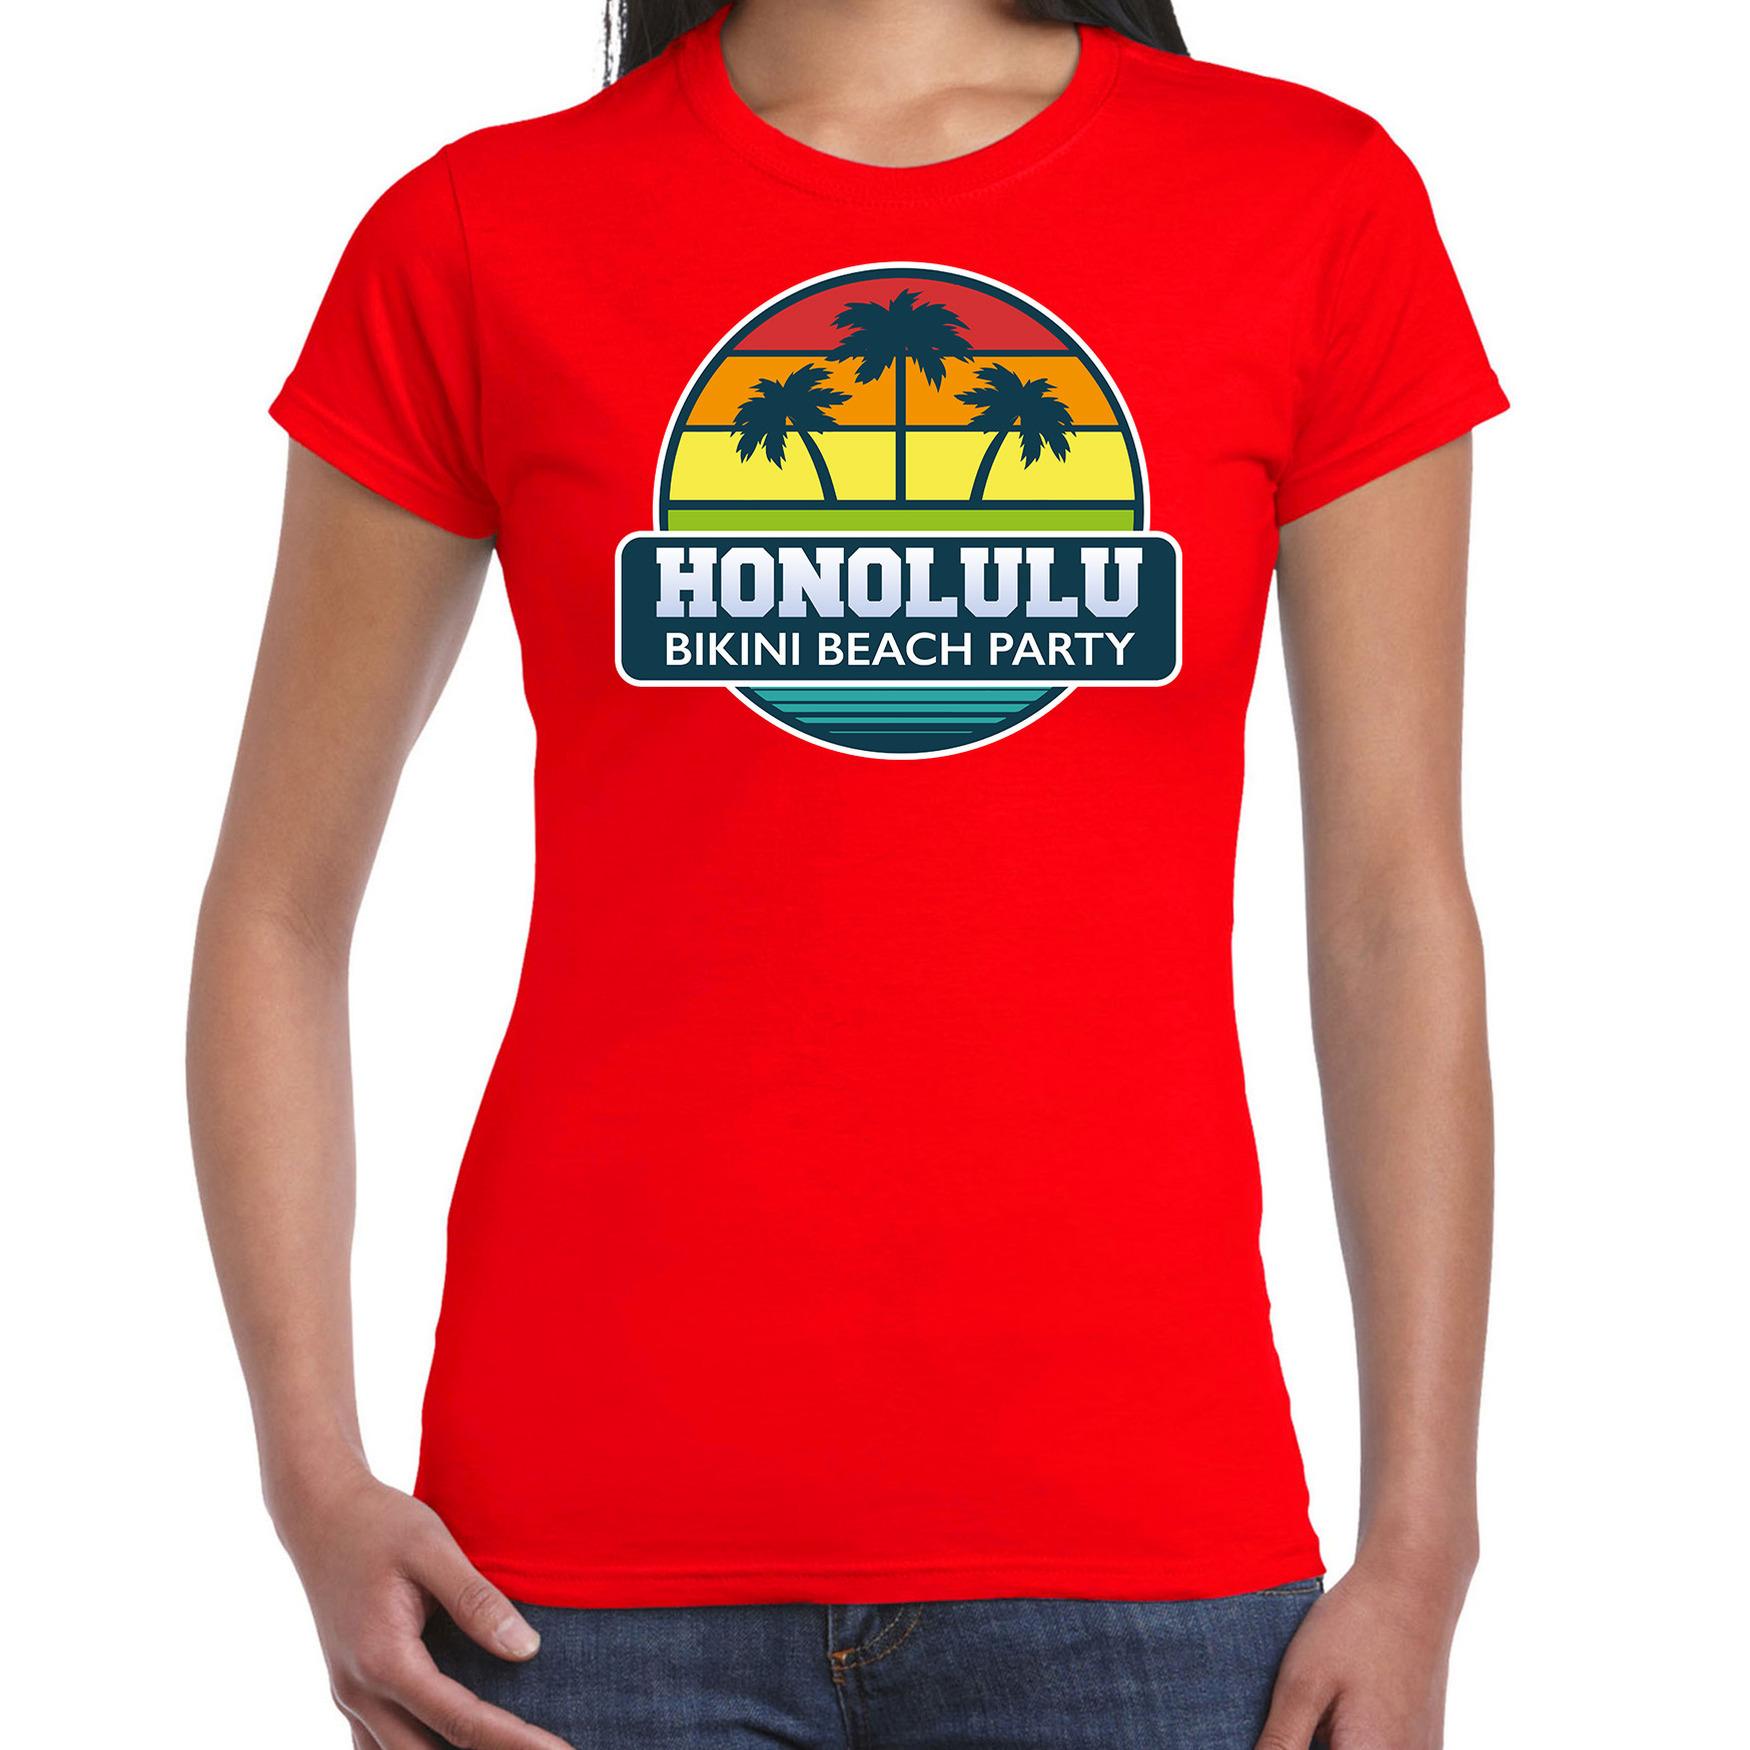 Honolulu bikini beach party shirt beach - strandfeest vakantie outfit - kleding rood voor dames